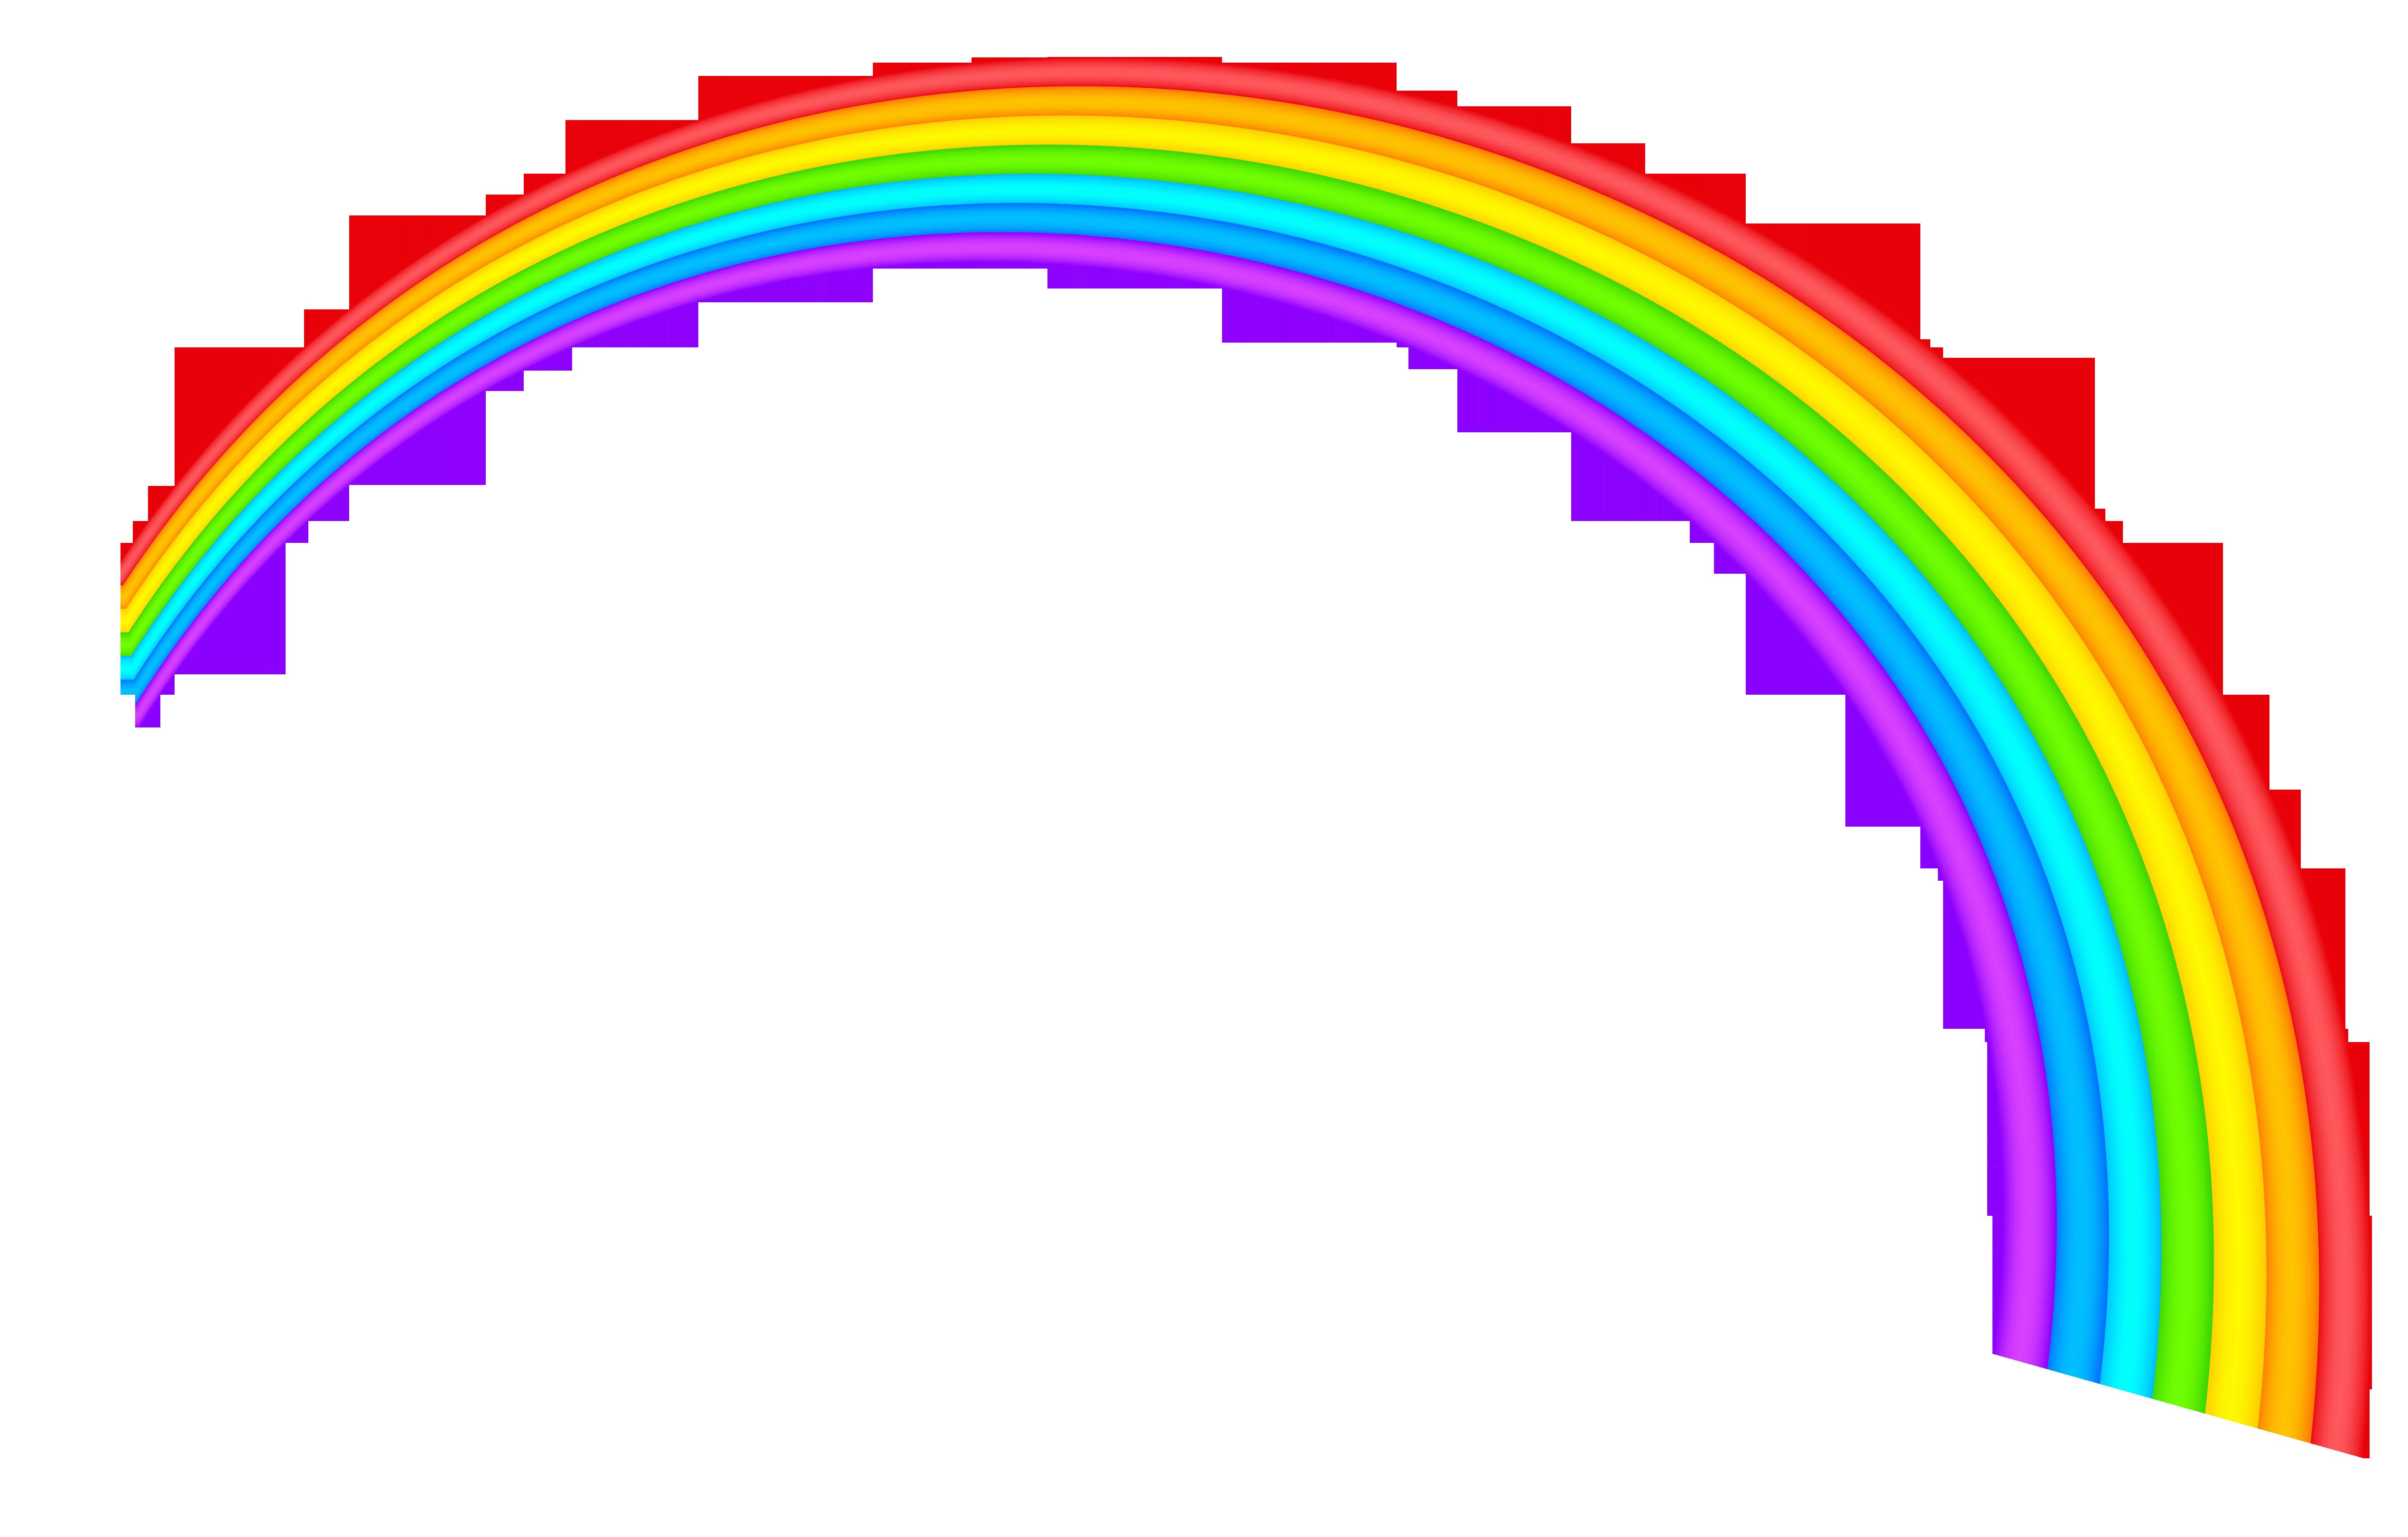 5076x3239 Rainbow Transparent Clipart Pictureu200b Gallery Yopriceville